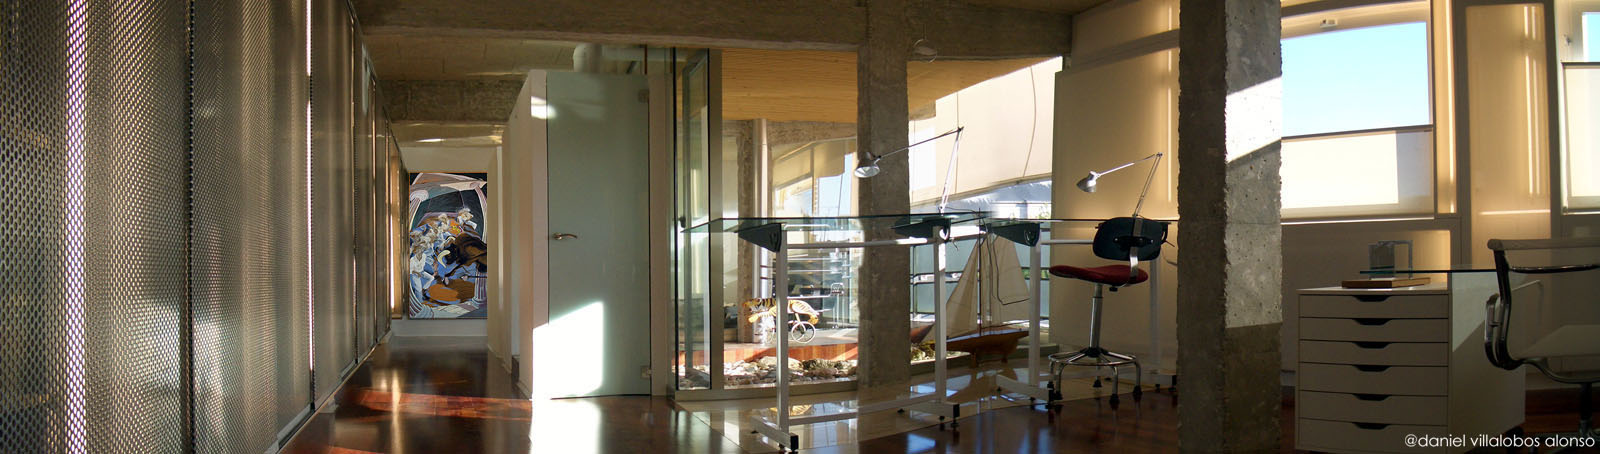 danielvillalobos-architecturexxithcentury-spanisharchitecture-14